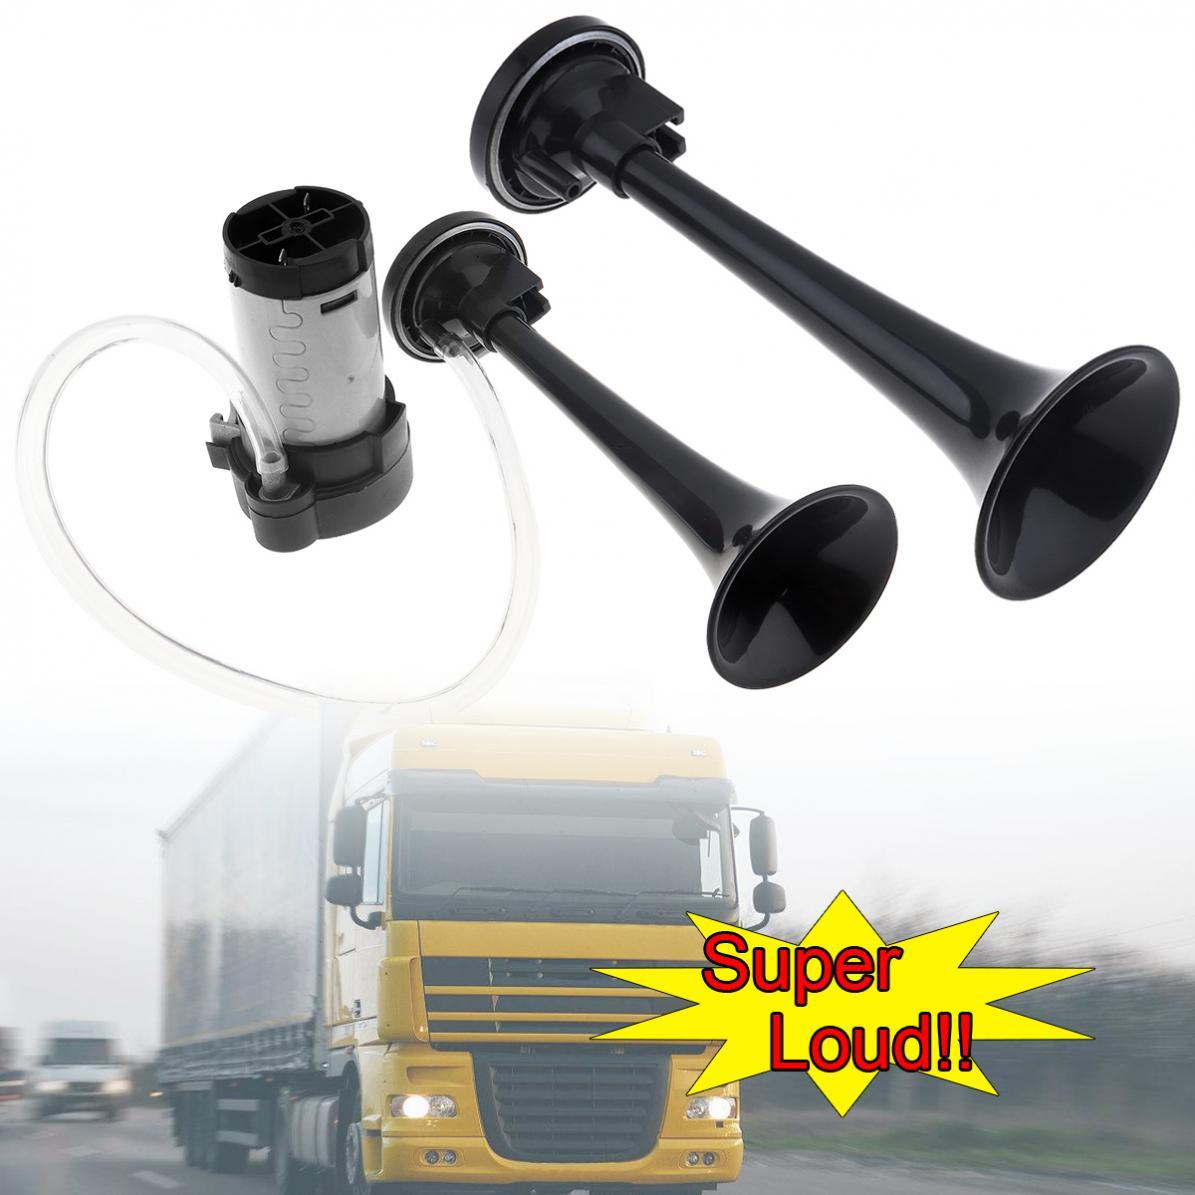 Bocina de aire de coche de 12V 178DB súper fuerte y doble Universal, bocina de aire controlada electrónicamente con compresor para coches/camiones/barcos